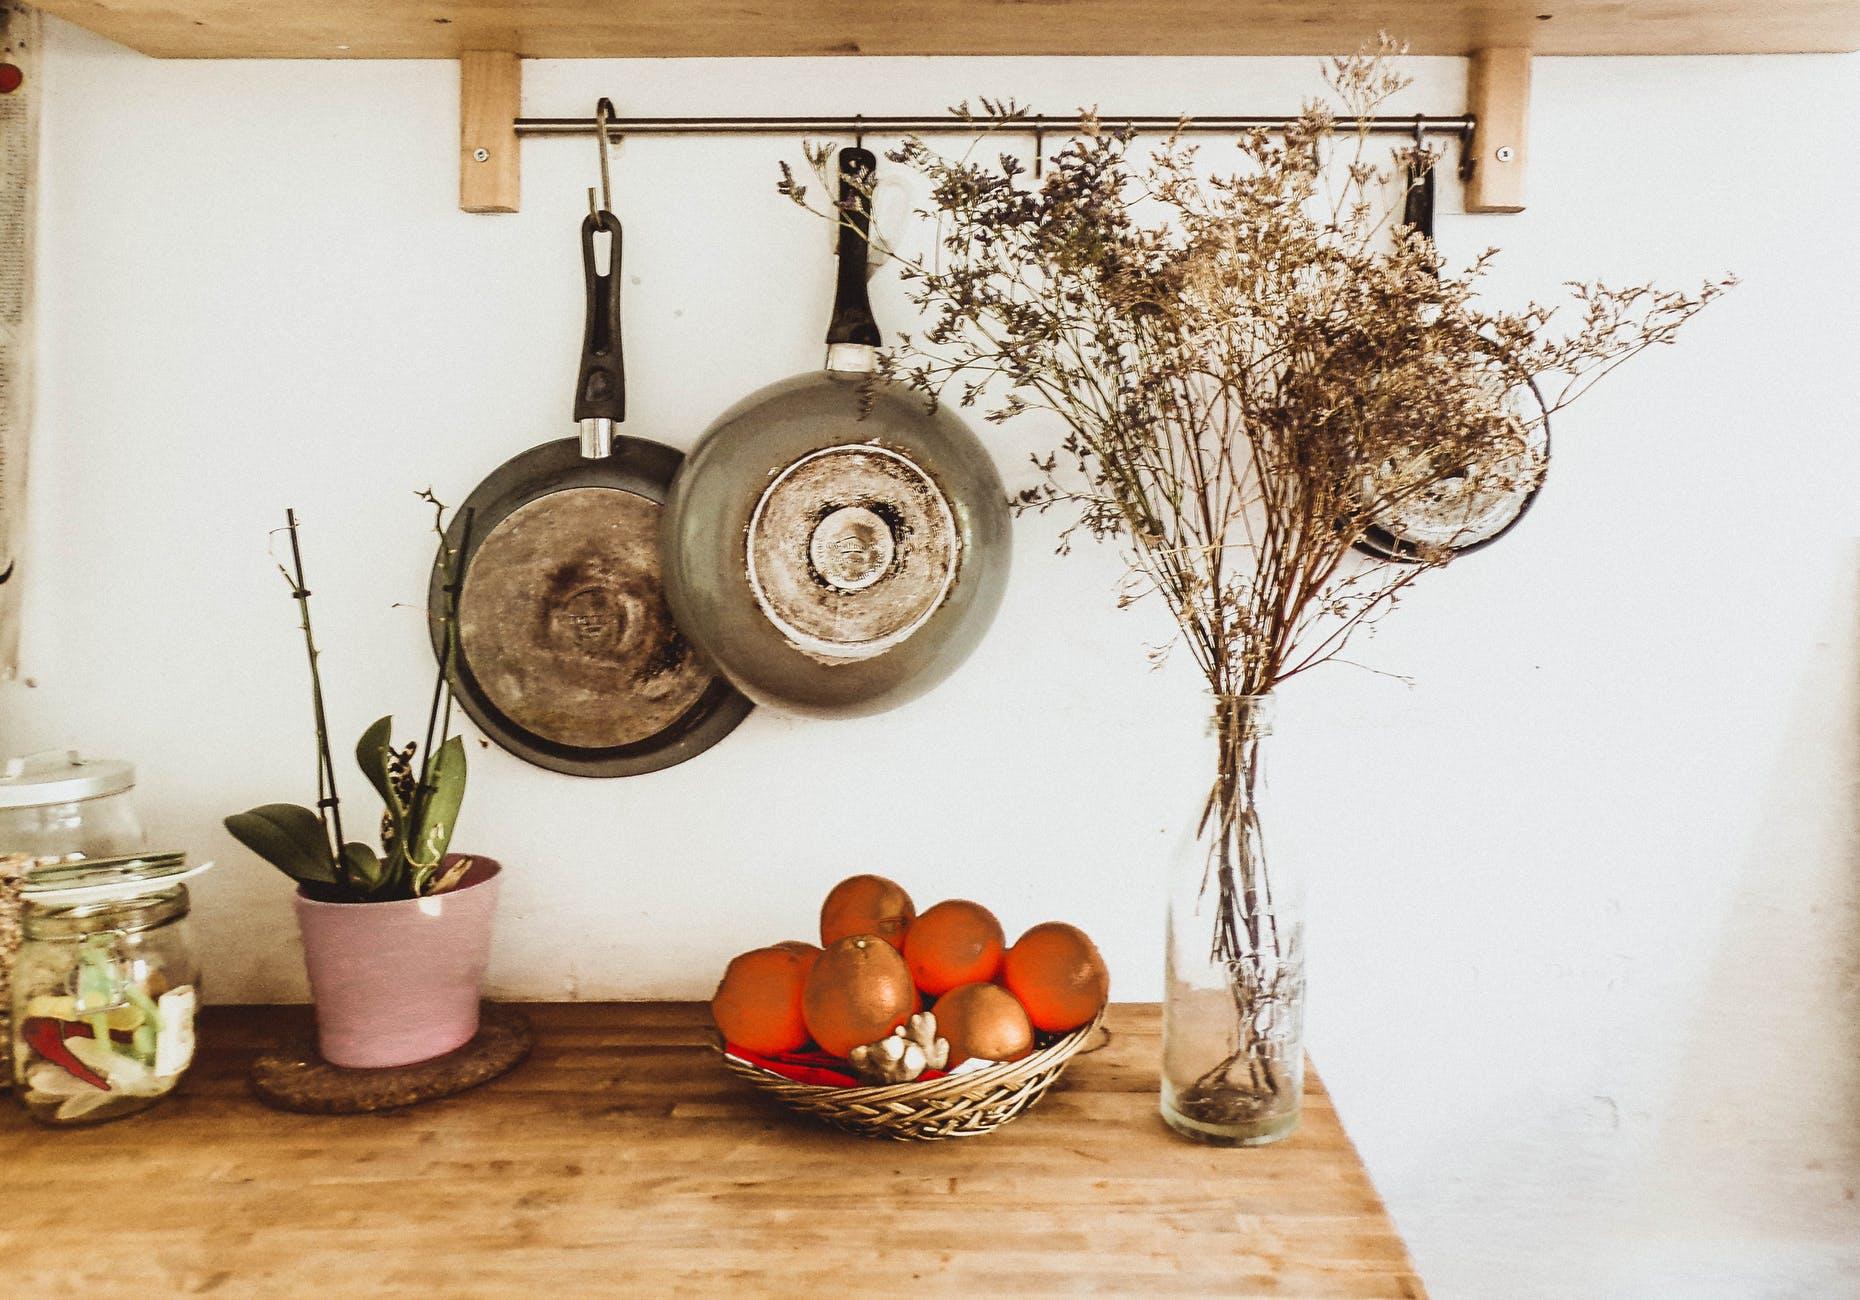 Arredare una cucina lunga e stretta i mobili adatti